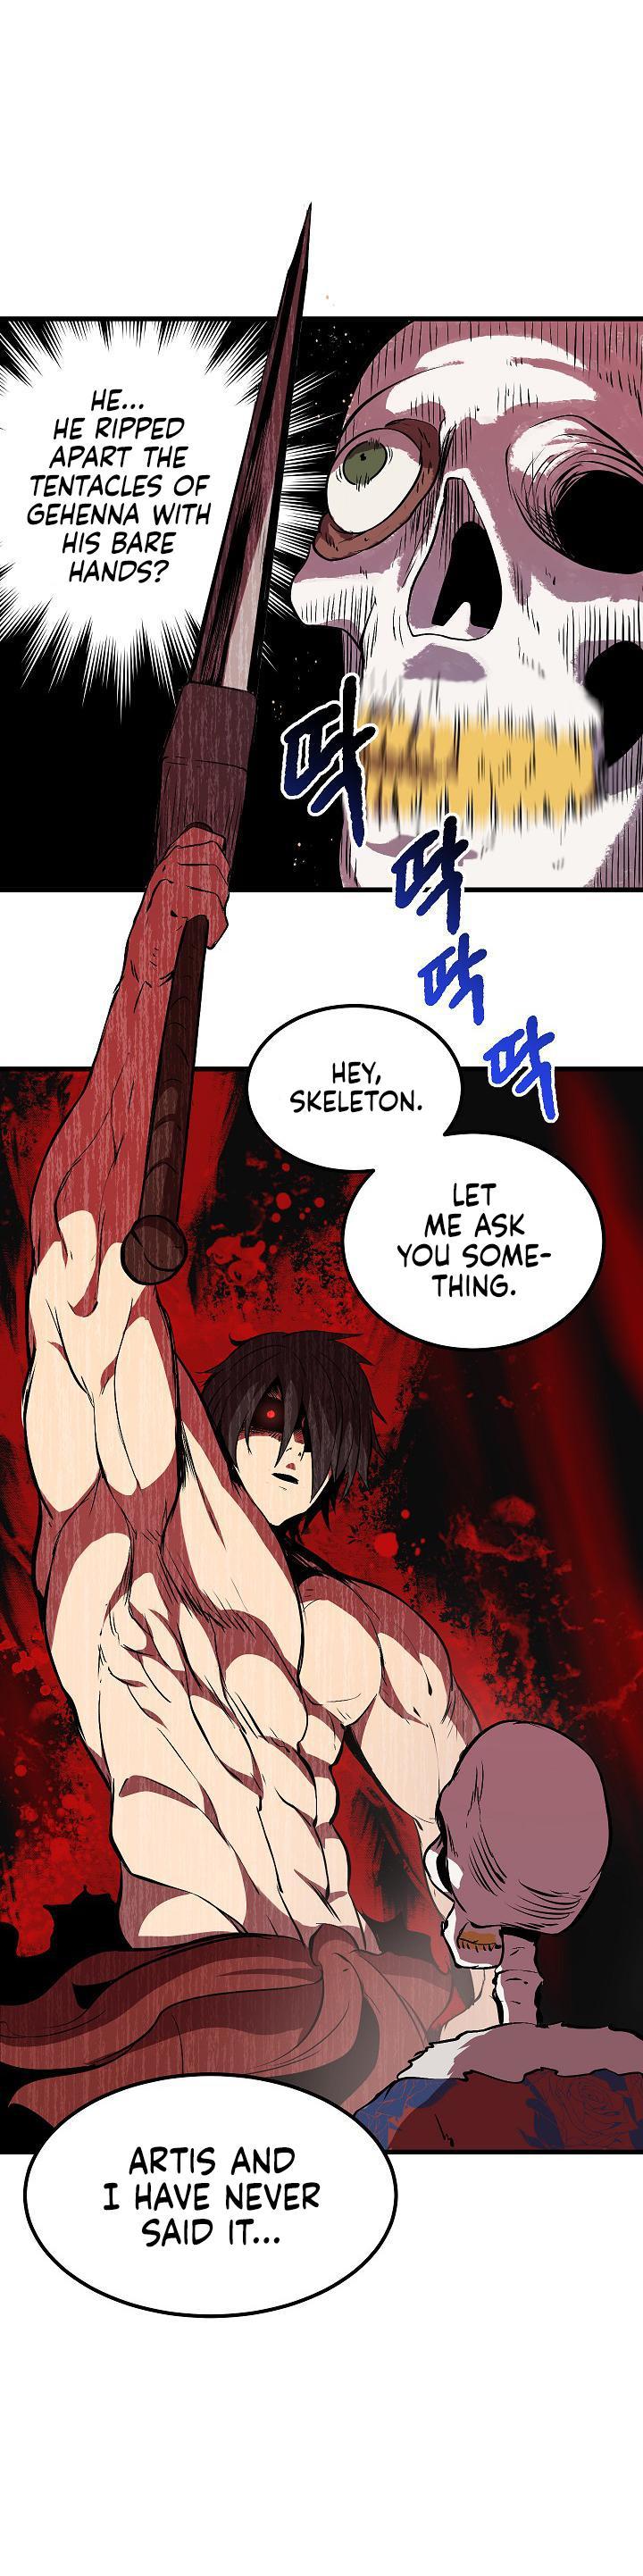 Survival Story Of A Sword King In A Fantasy World Vol.1 Chapter 19 page 37 - Mangakakalots.com